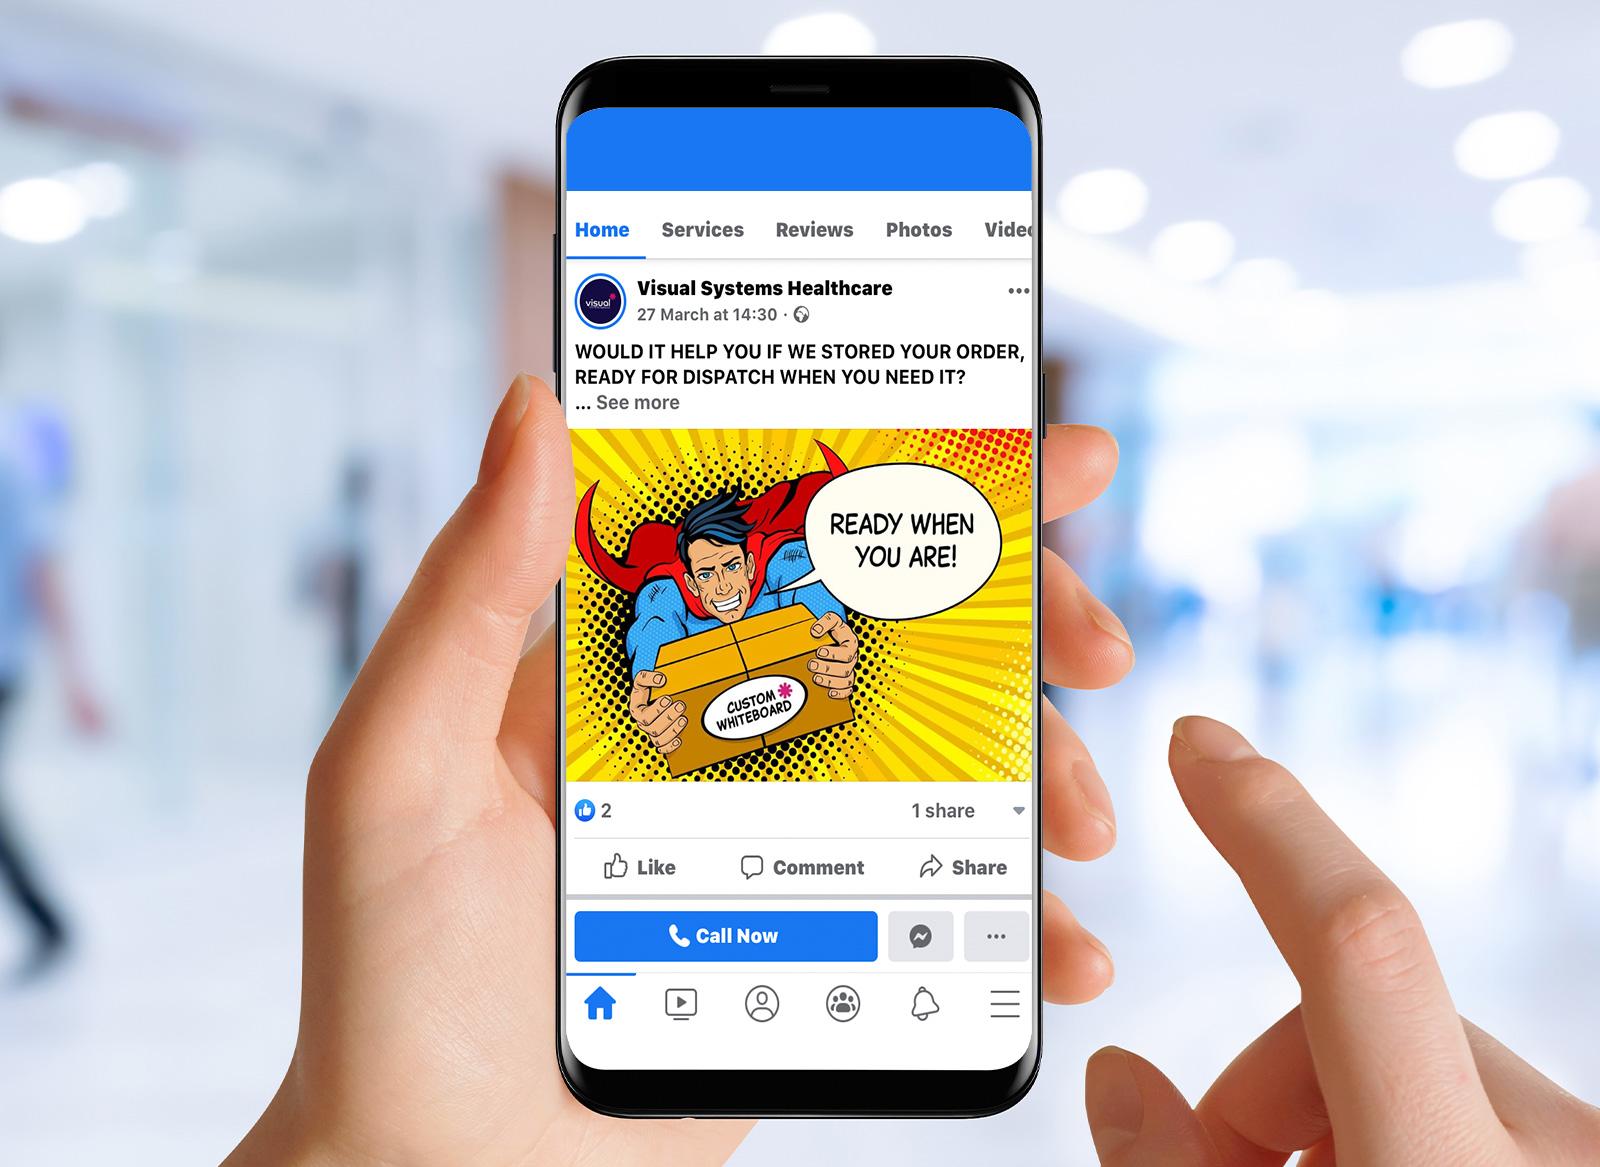 Visual Sysetms Healthcare Social Media